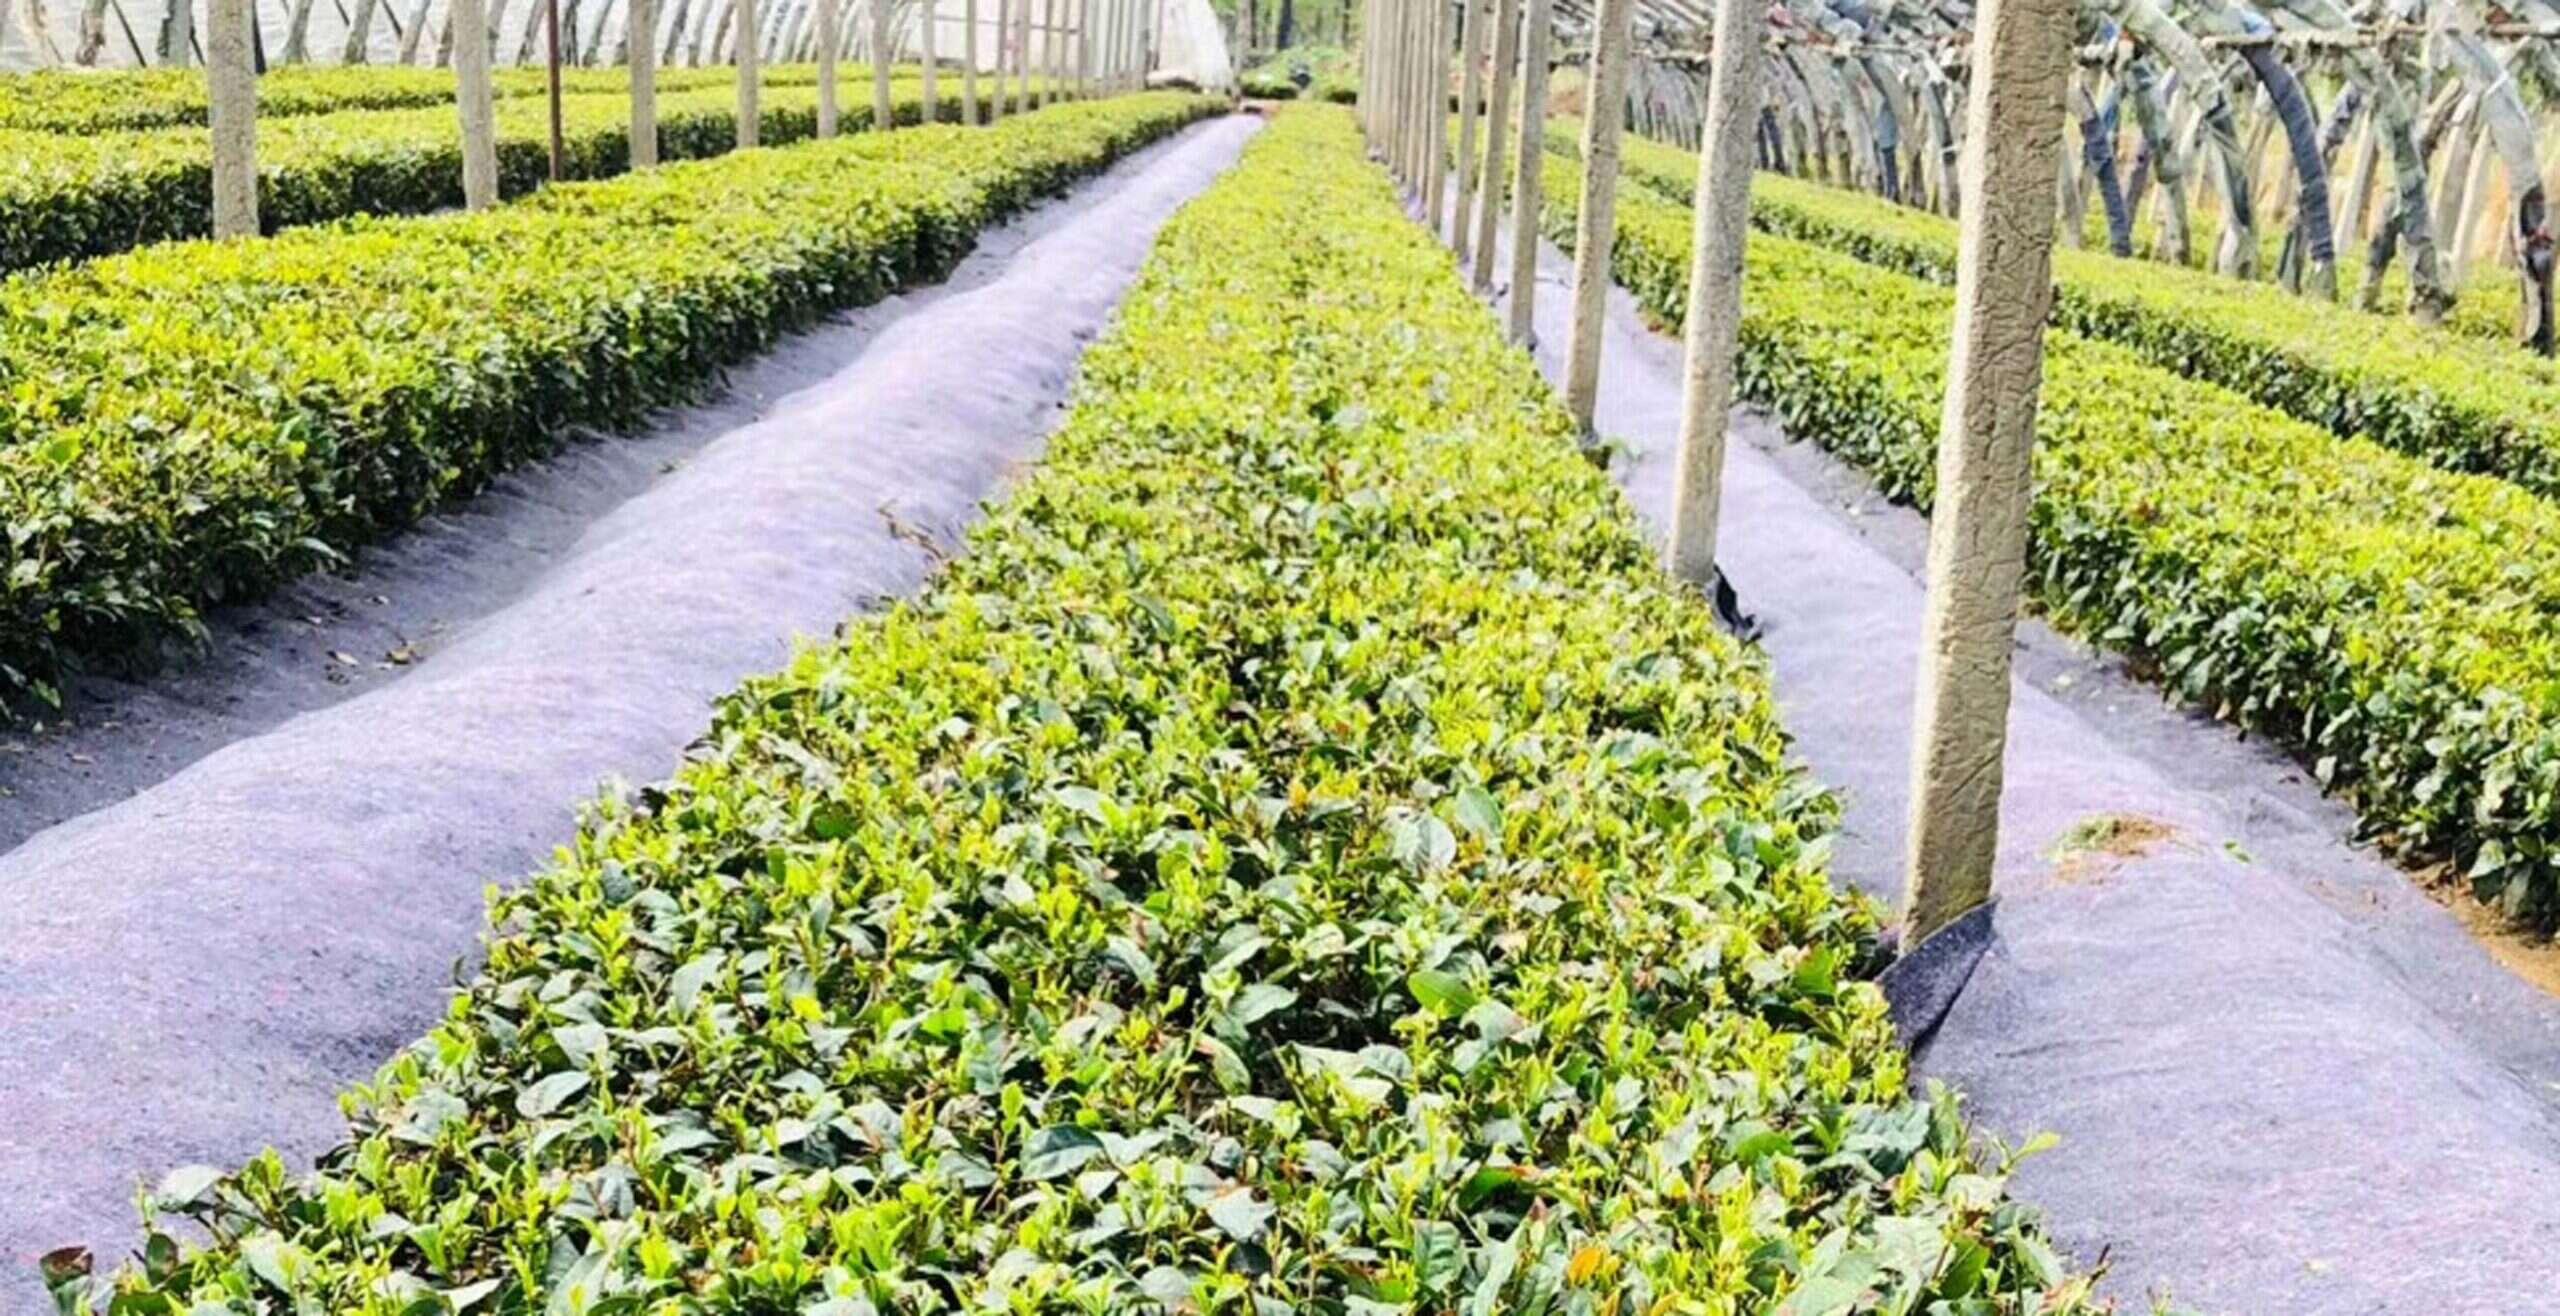 2020 Laoshan Spring Harvests